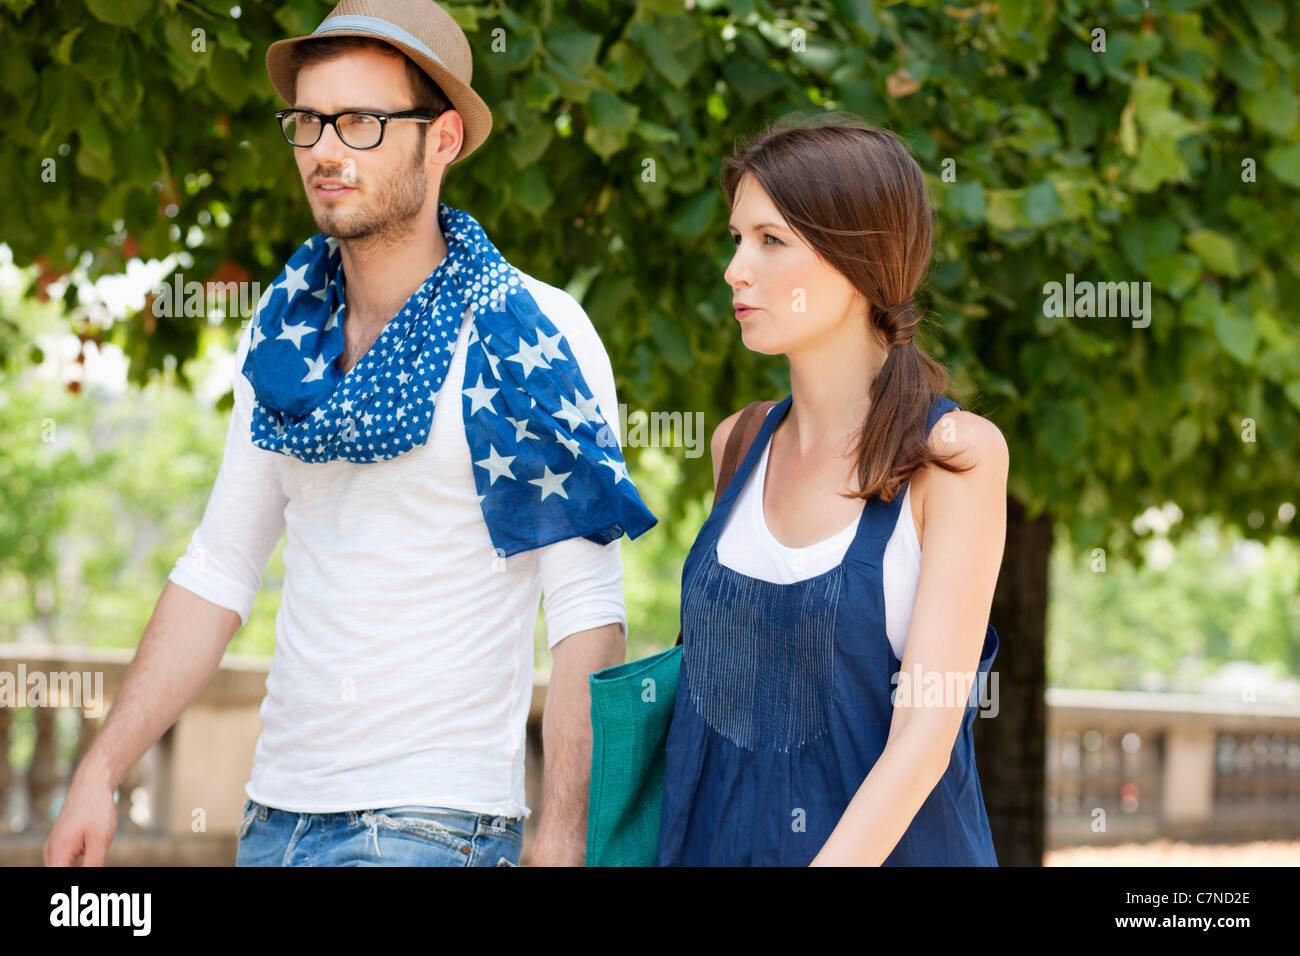 Couple walking together, Paris, Ile-de-France, France - Stock Image